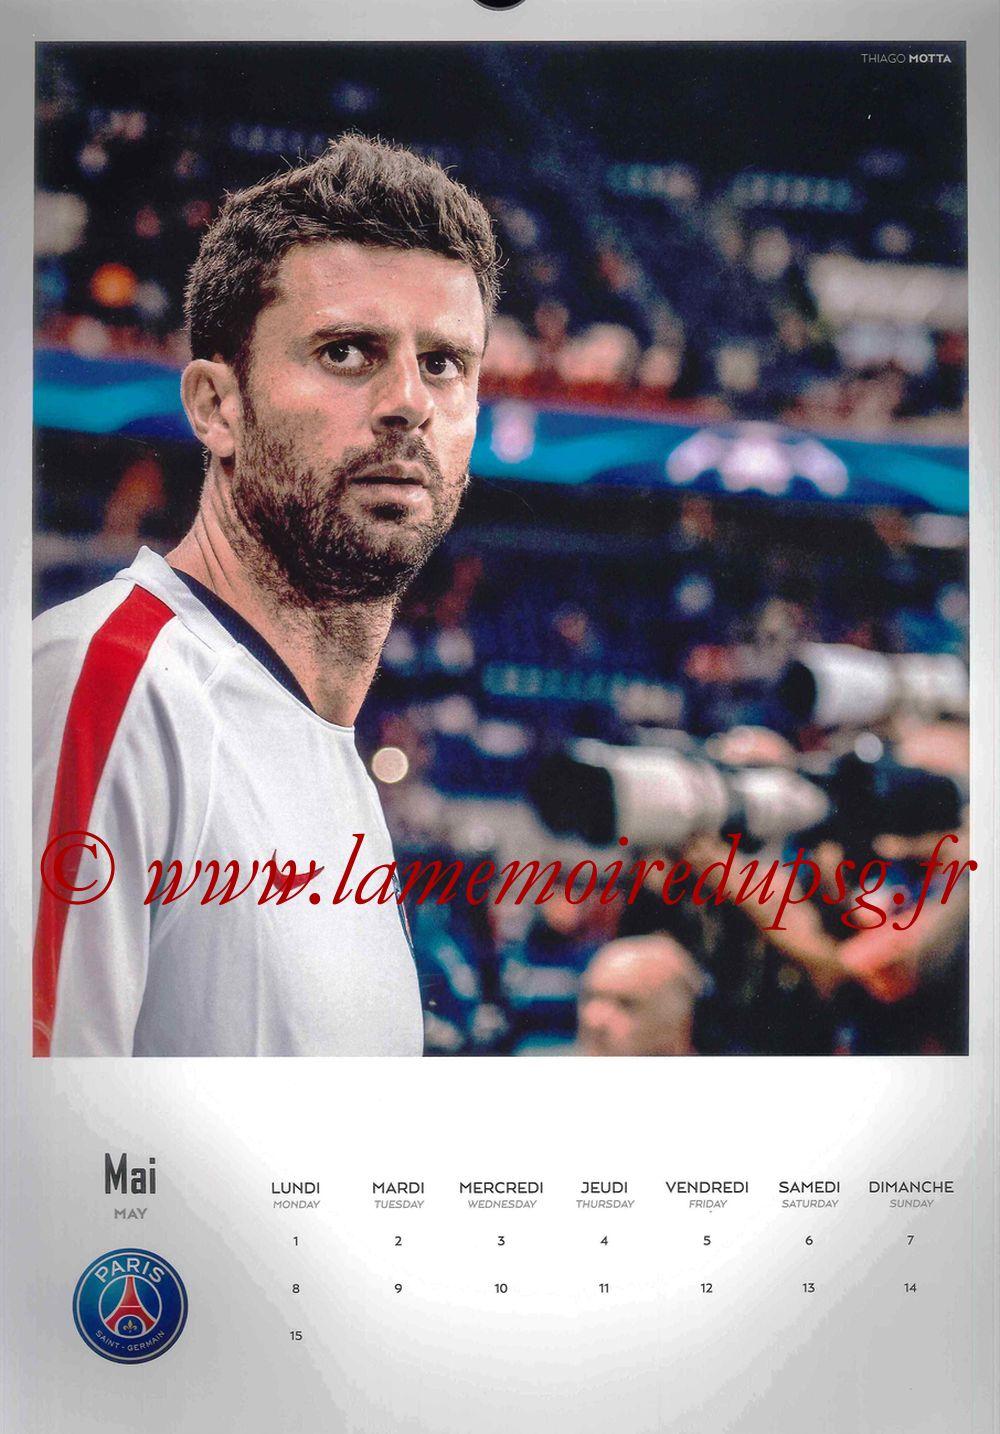 Calendrier PSG 2017 - Page 09 - Thiago MOTTA